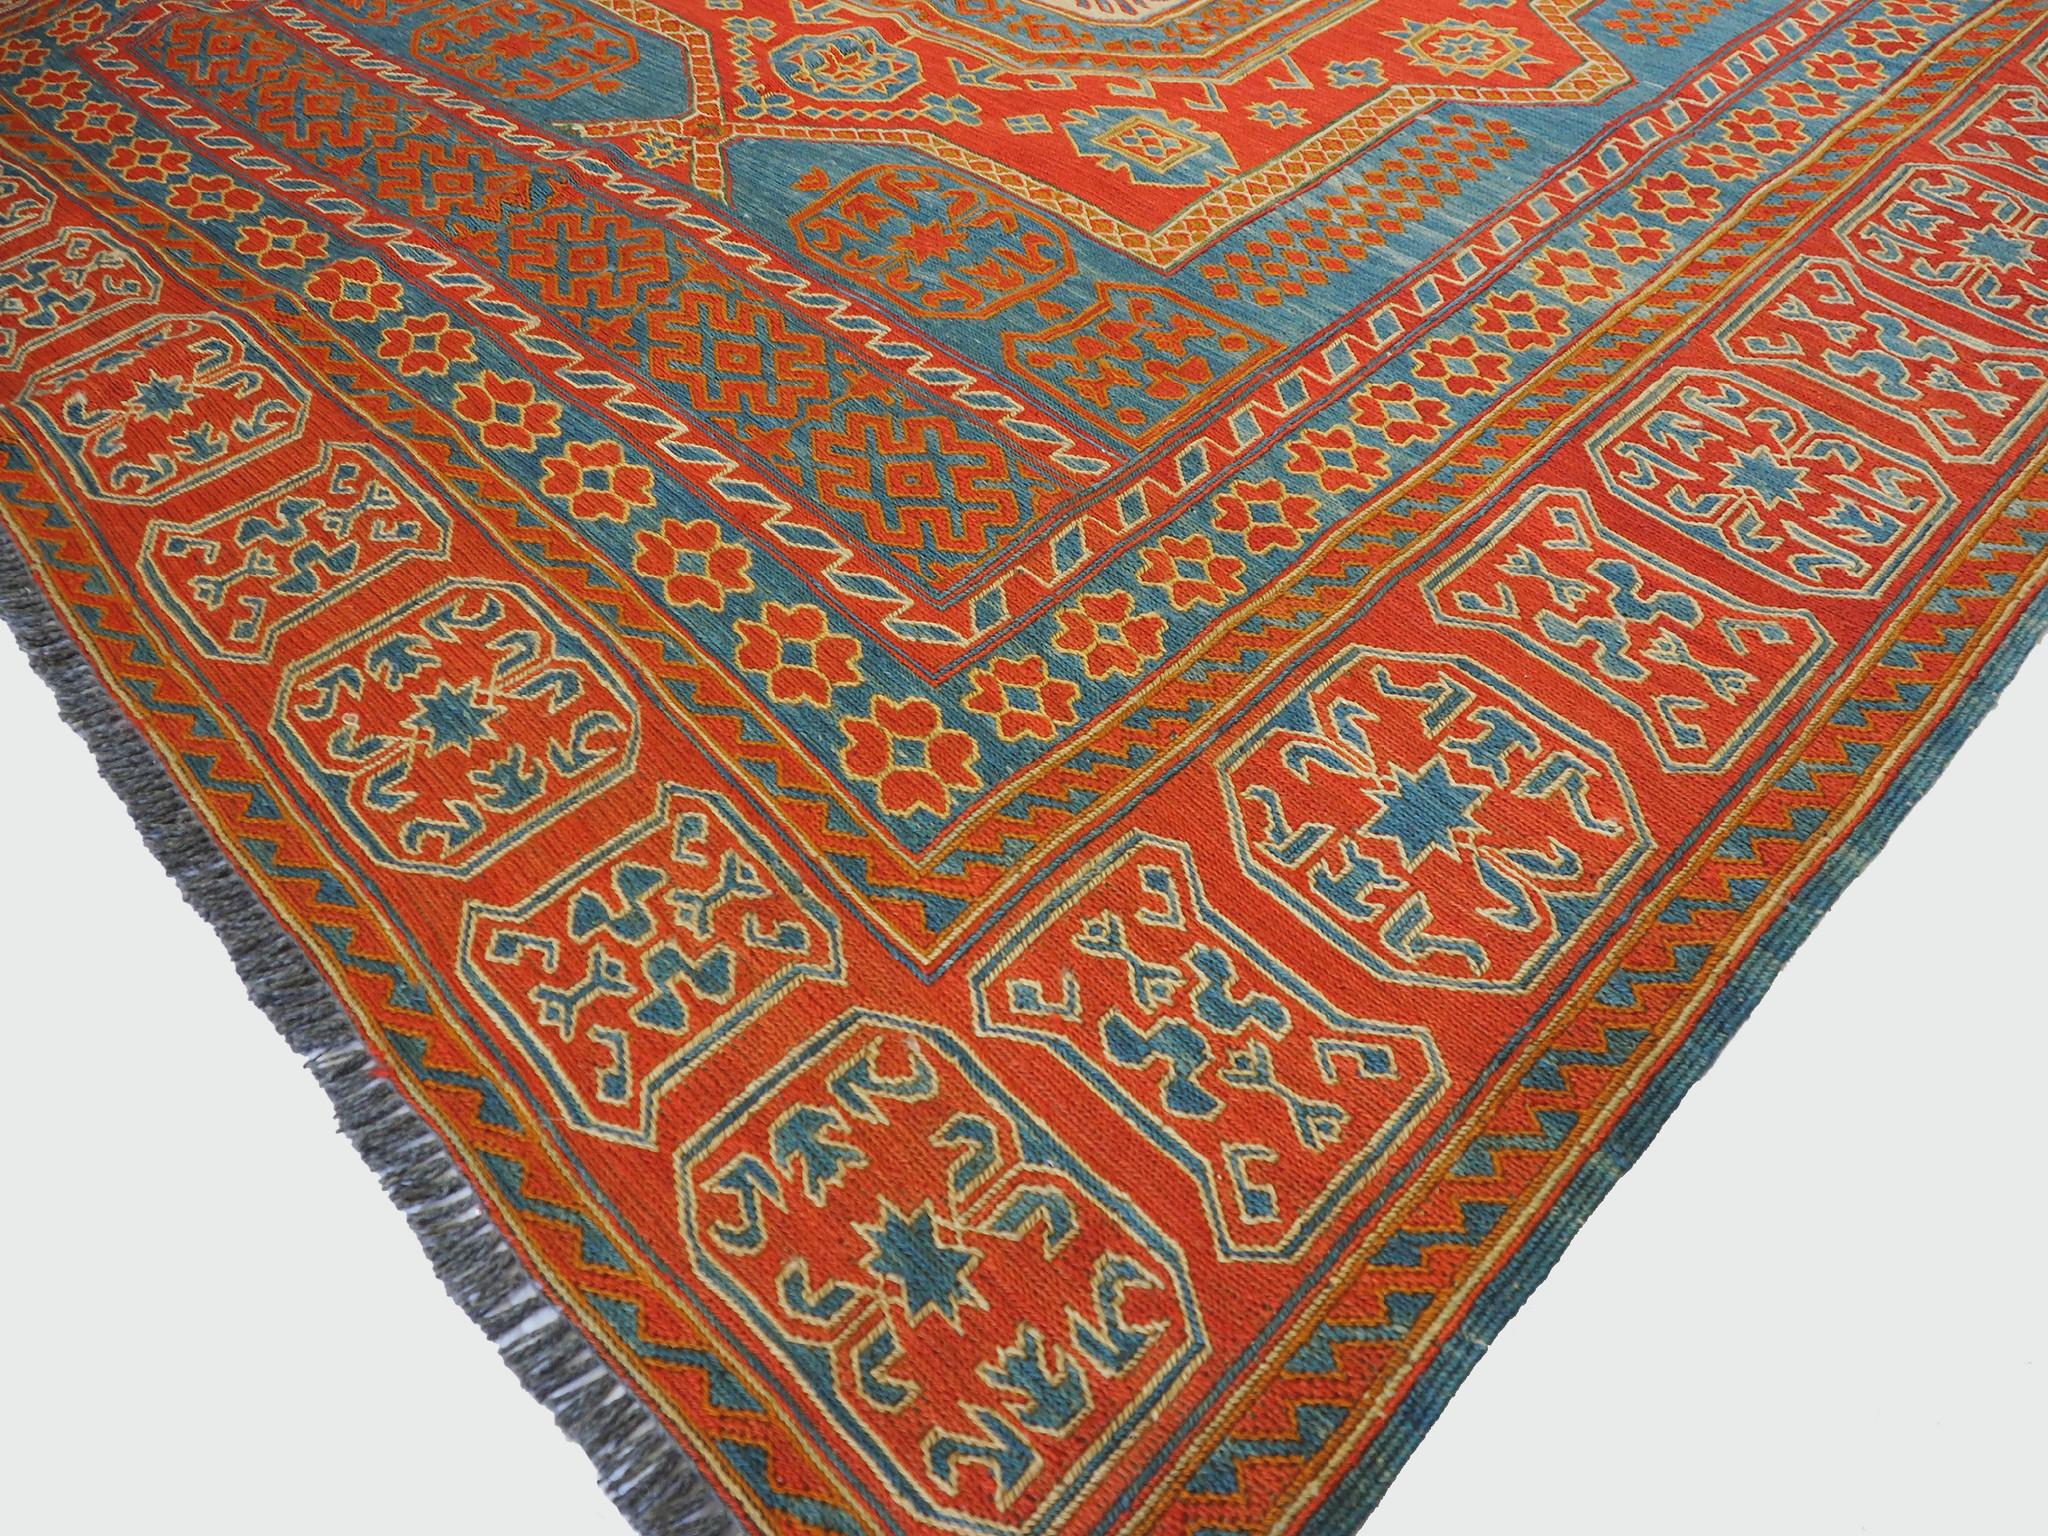 245x150 cm Caucasian Soumak Kilim Rug WL/H